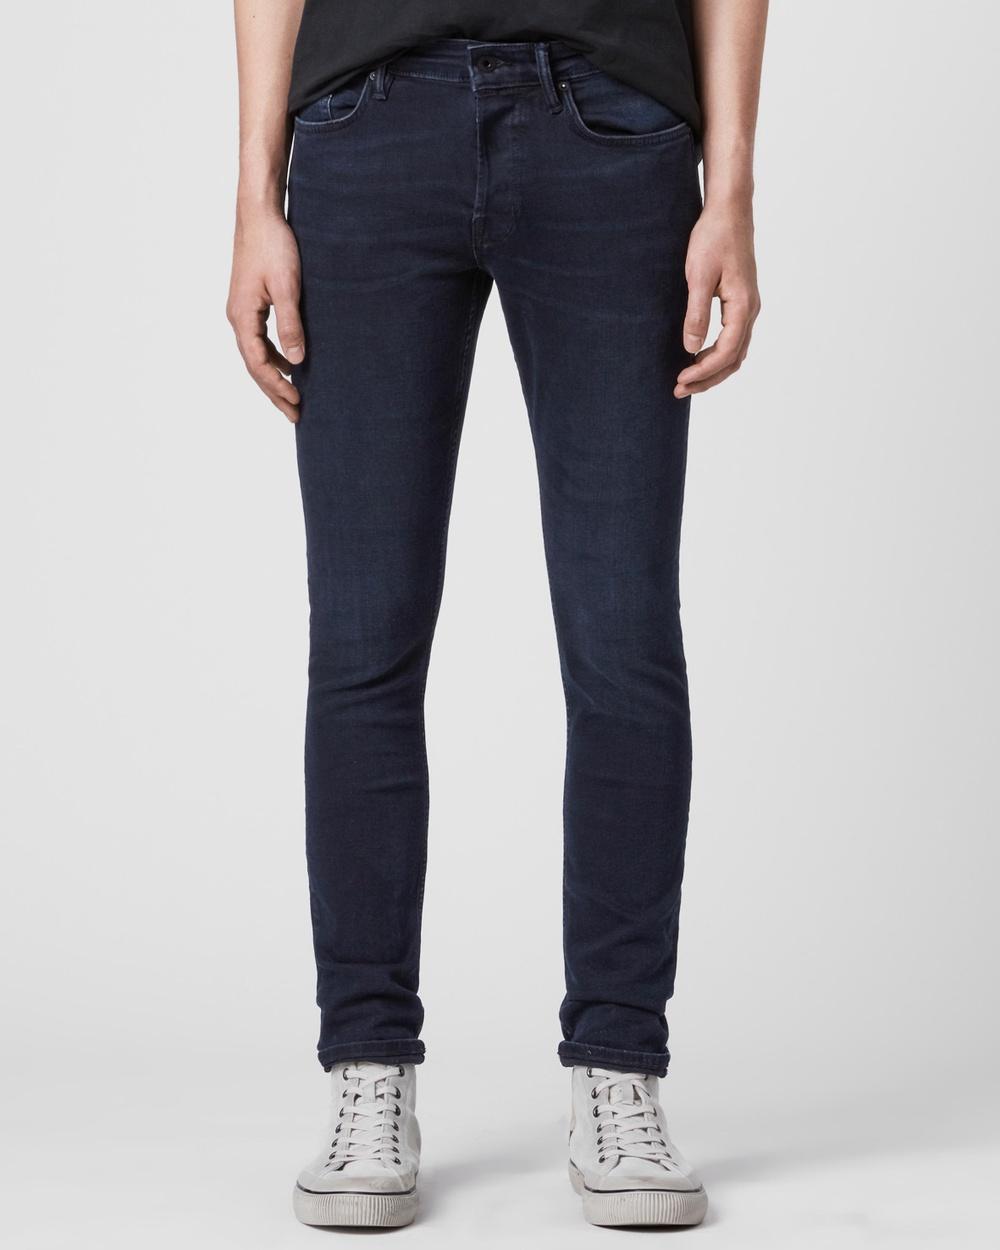 AllSaints Cigarette Skinny Jeans Blue Black